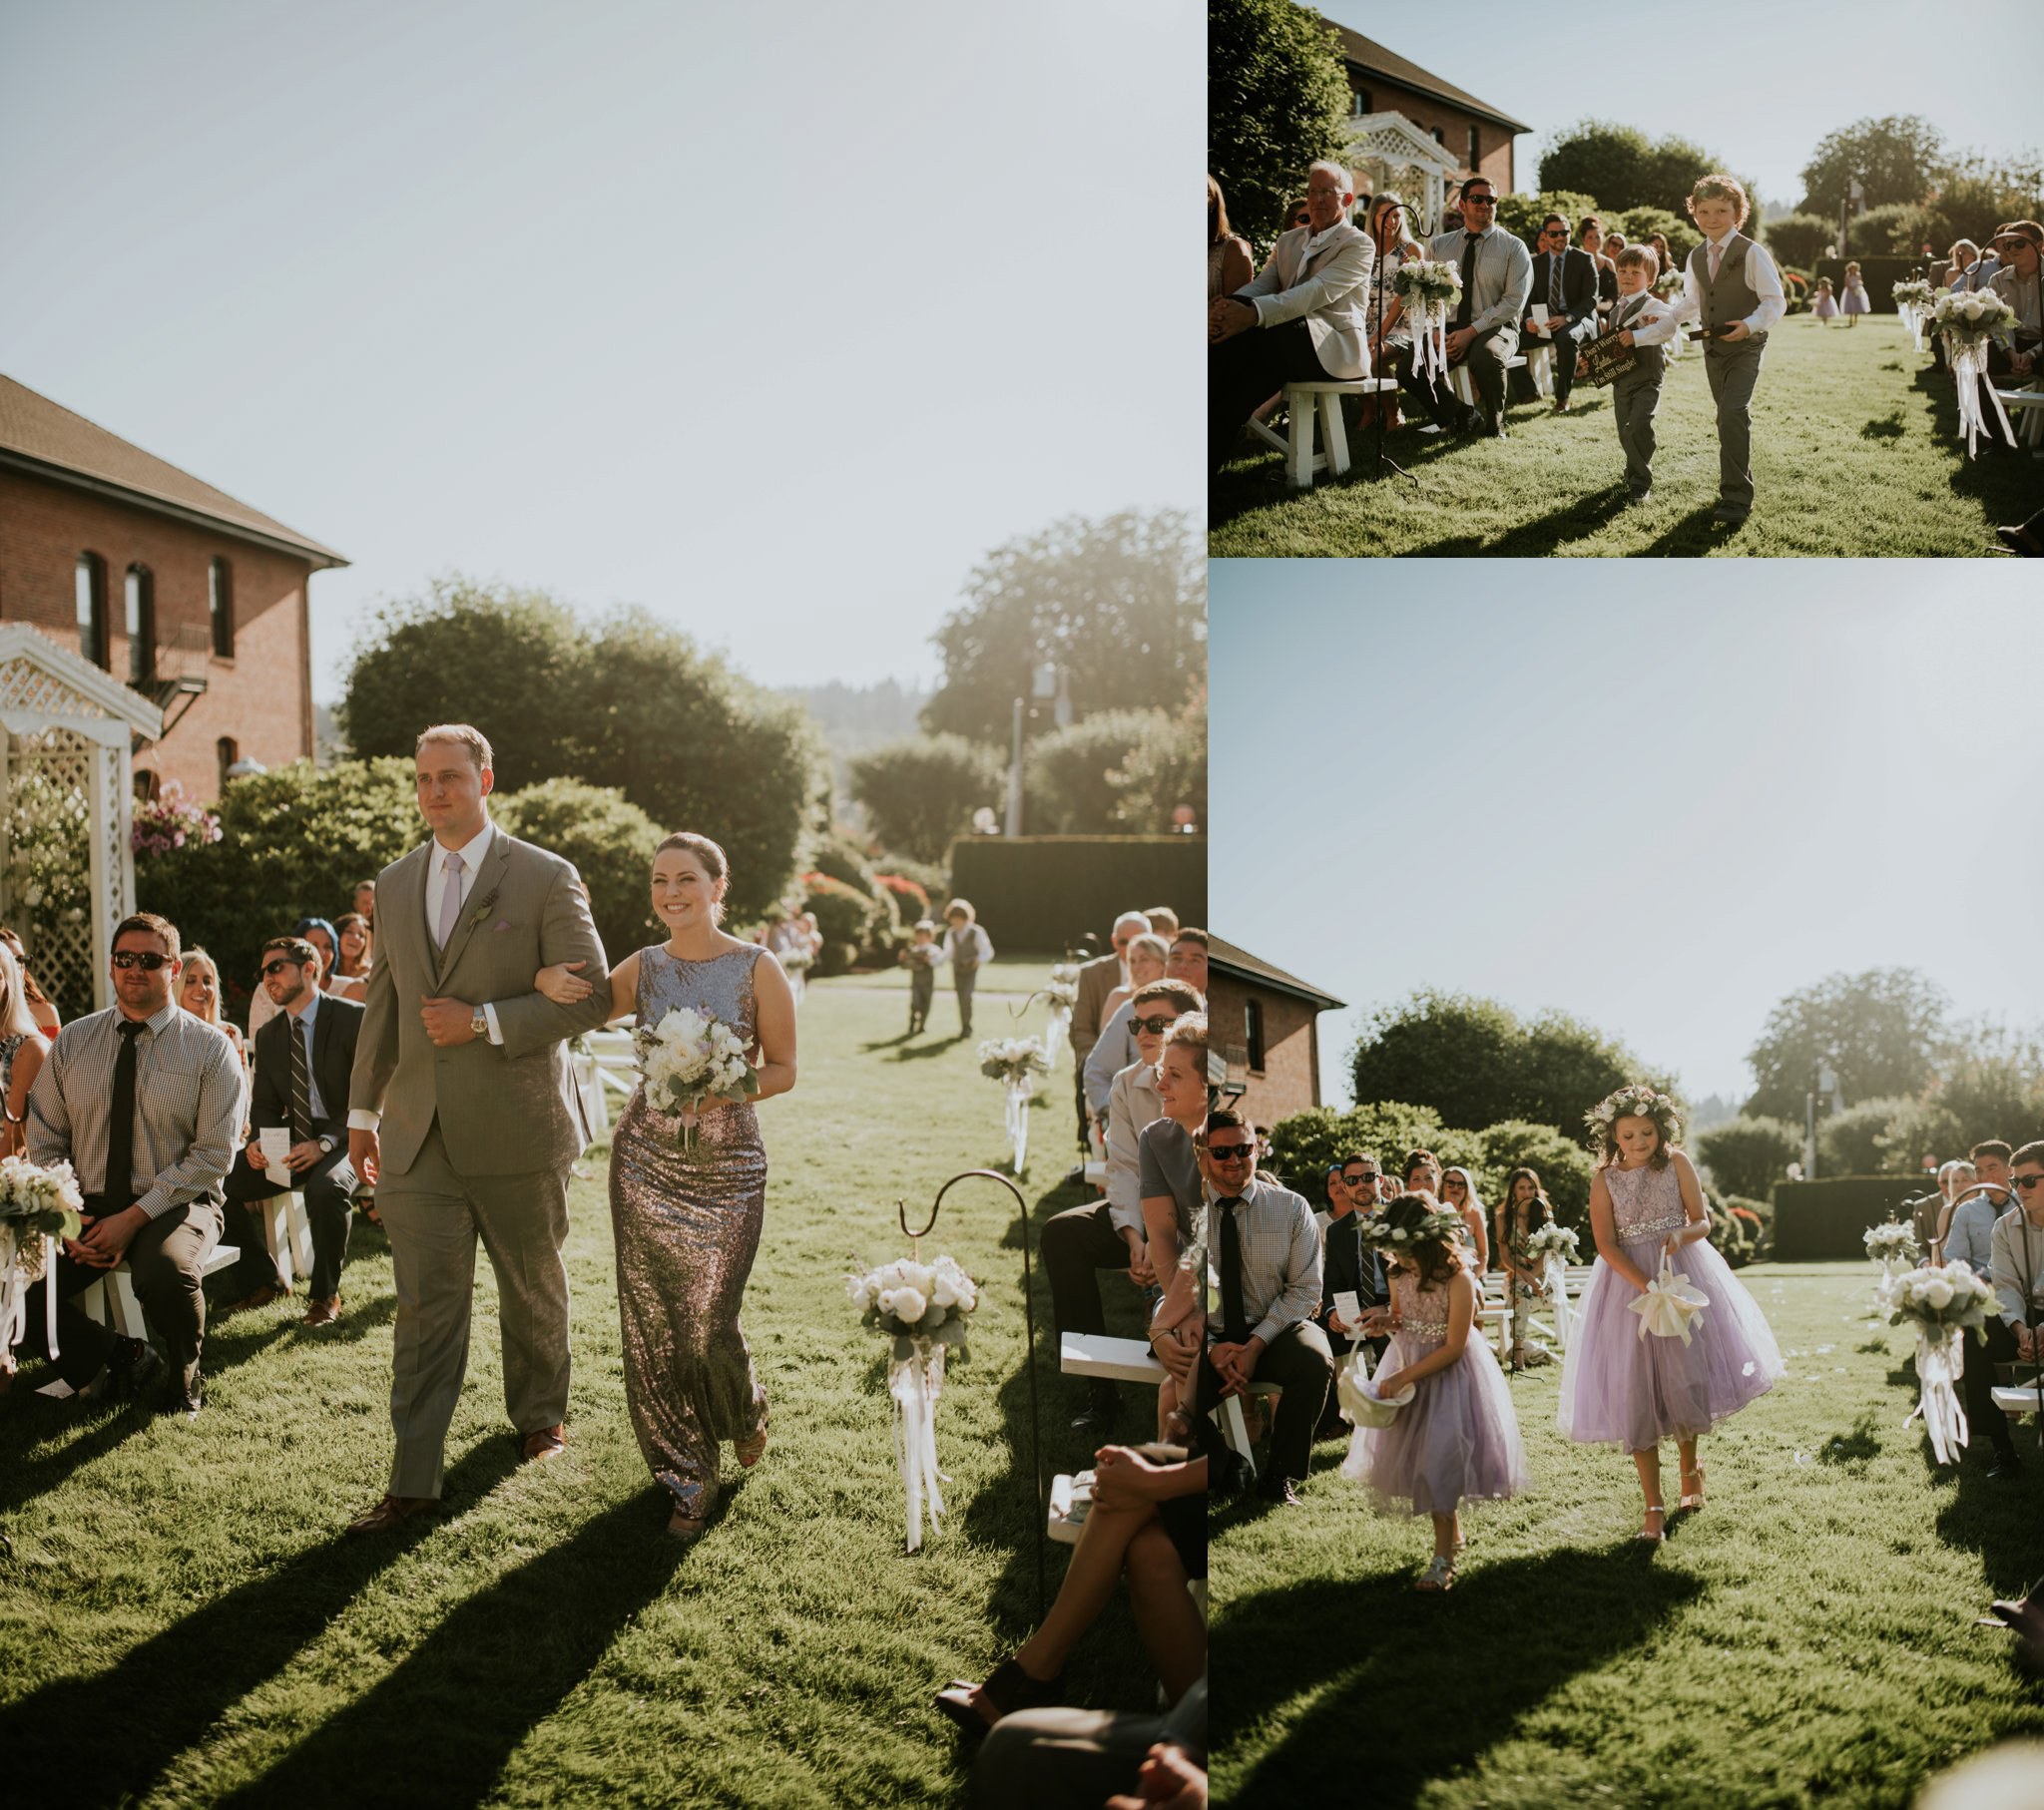 hollywood-school-house-wedding-seattle-photographer-caitlyn-nikula-69.jpg